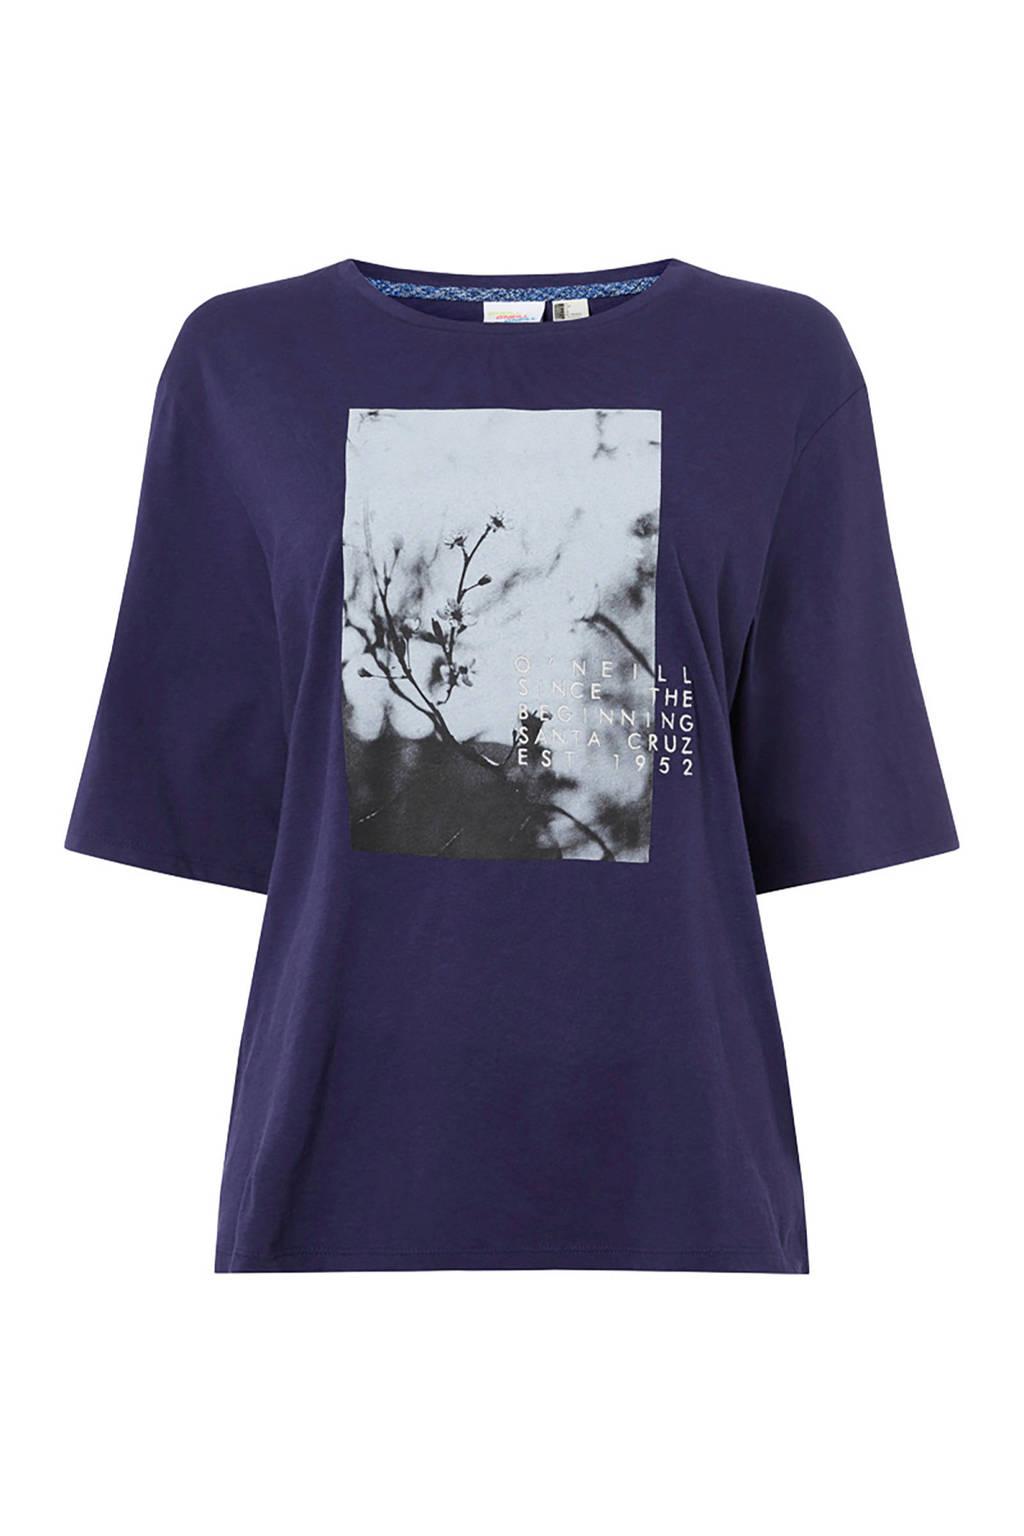 WE Fashion T-shirt met printopdruk donkerblauw, Donkerblauw